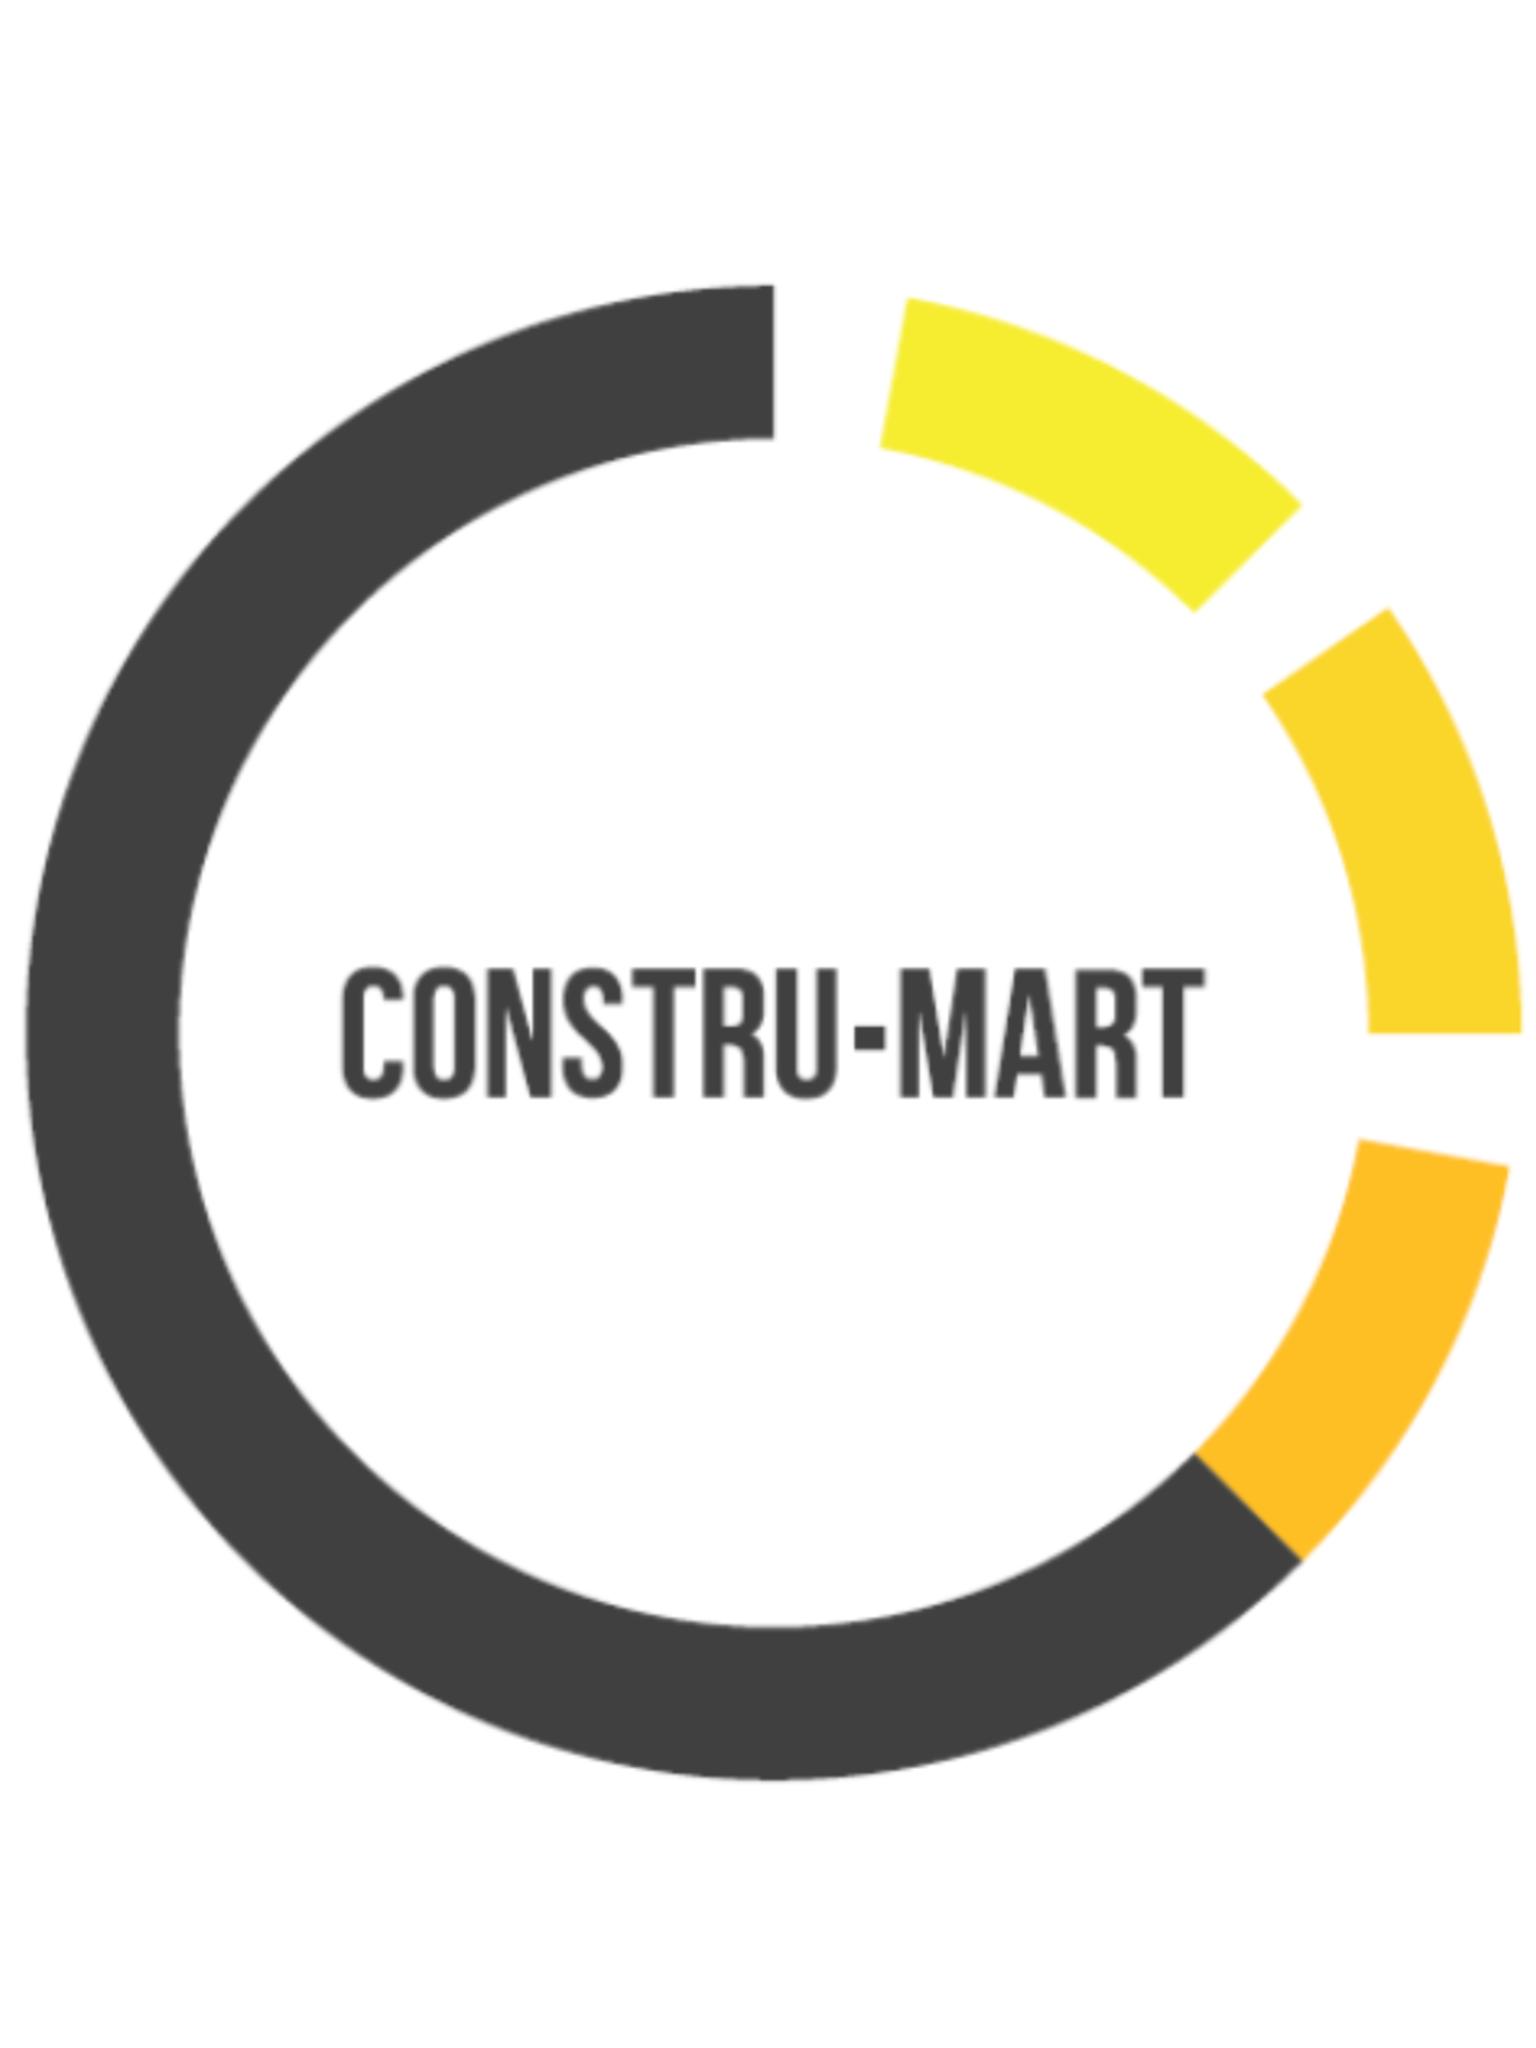 CONSTRU-MART